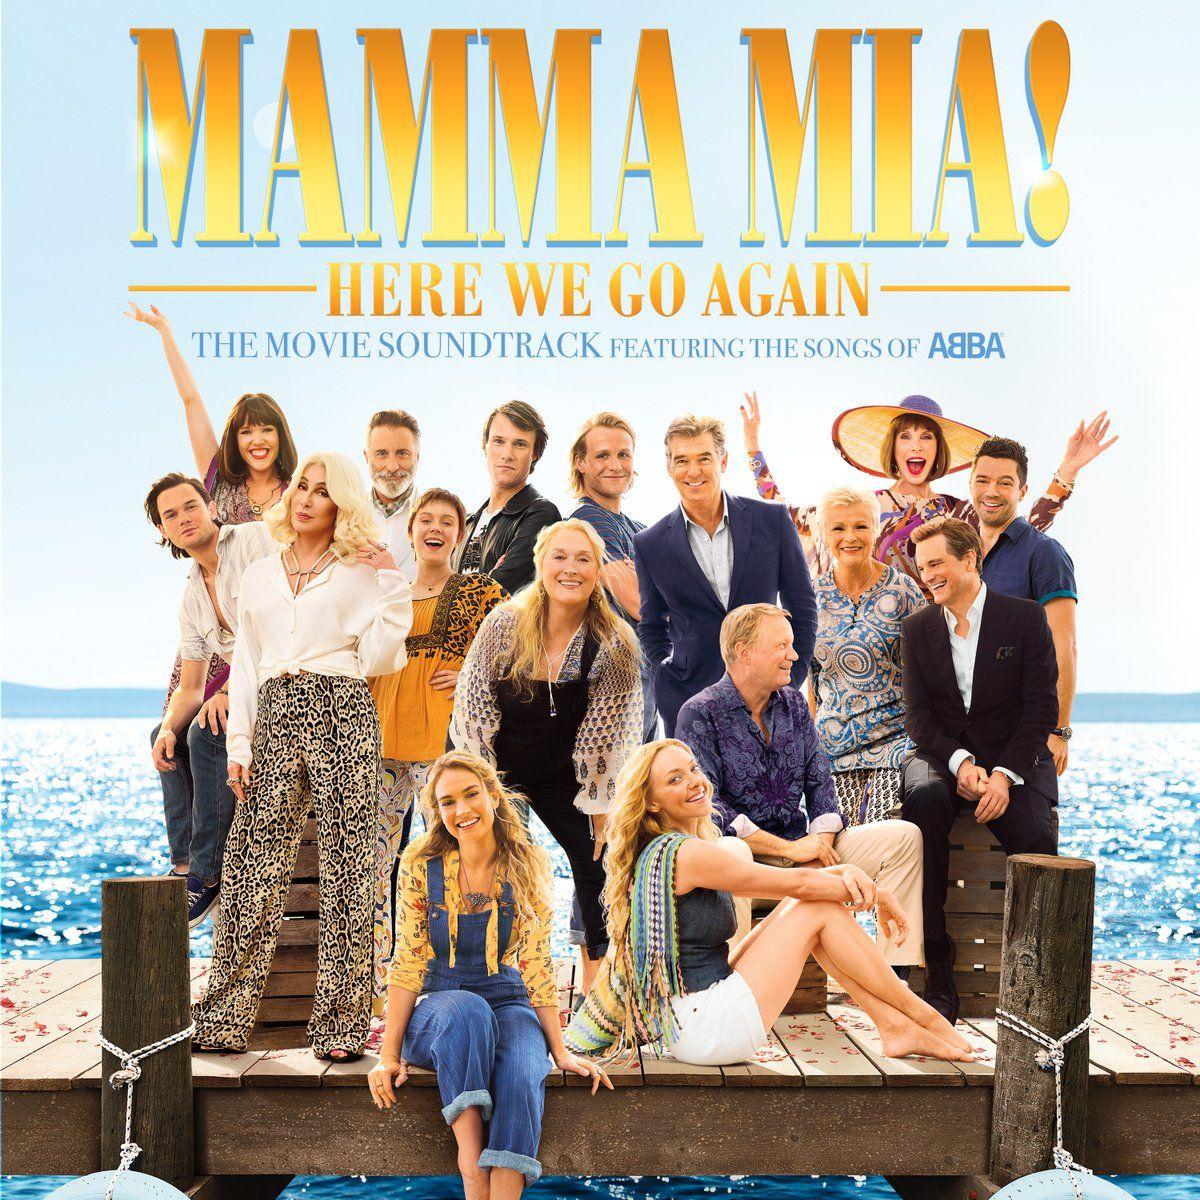 Mamma Mia Here We Go Again July 2018 Release Date Trailer